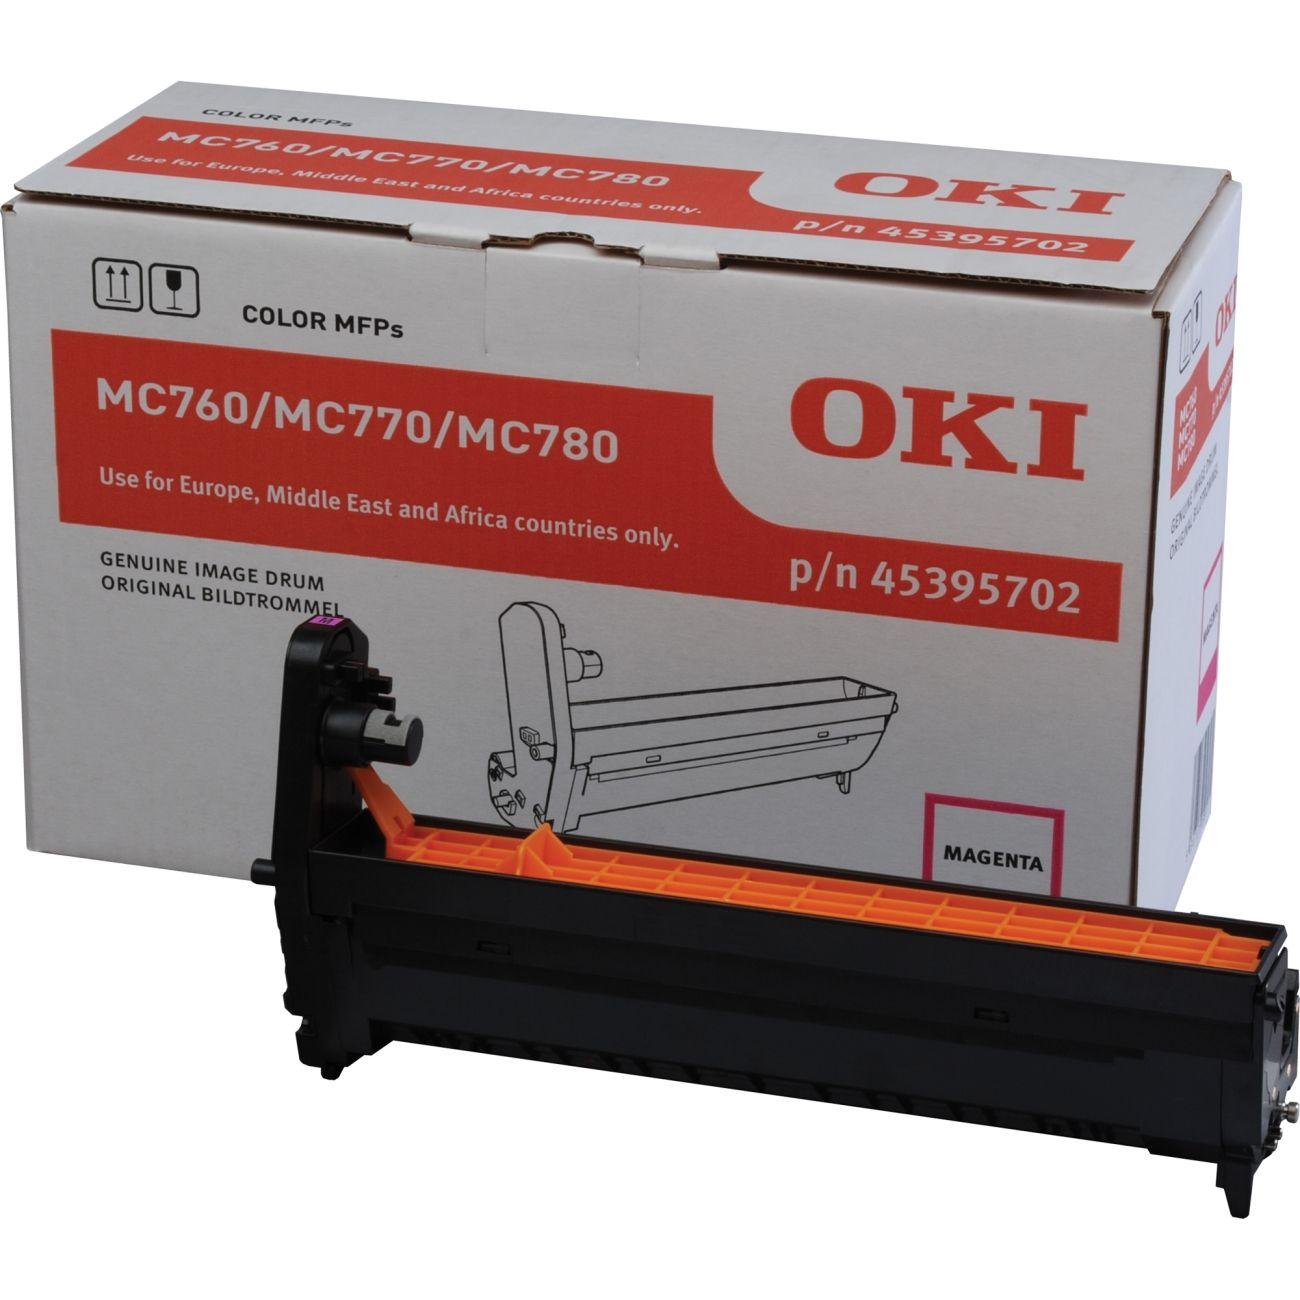 Kit Fotoconductor Oki 45395702 Magenta 30000 pag.